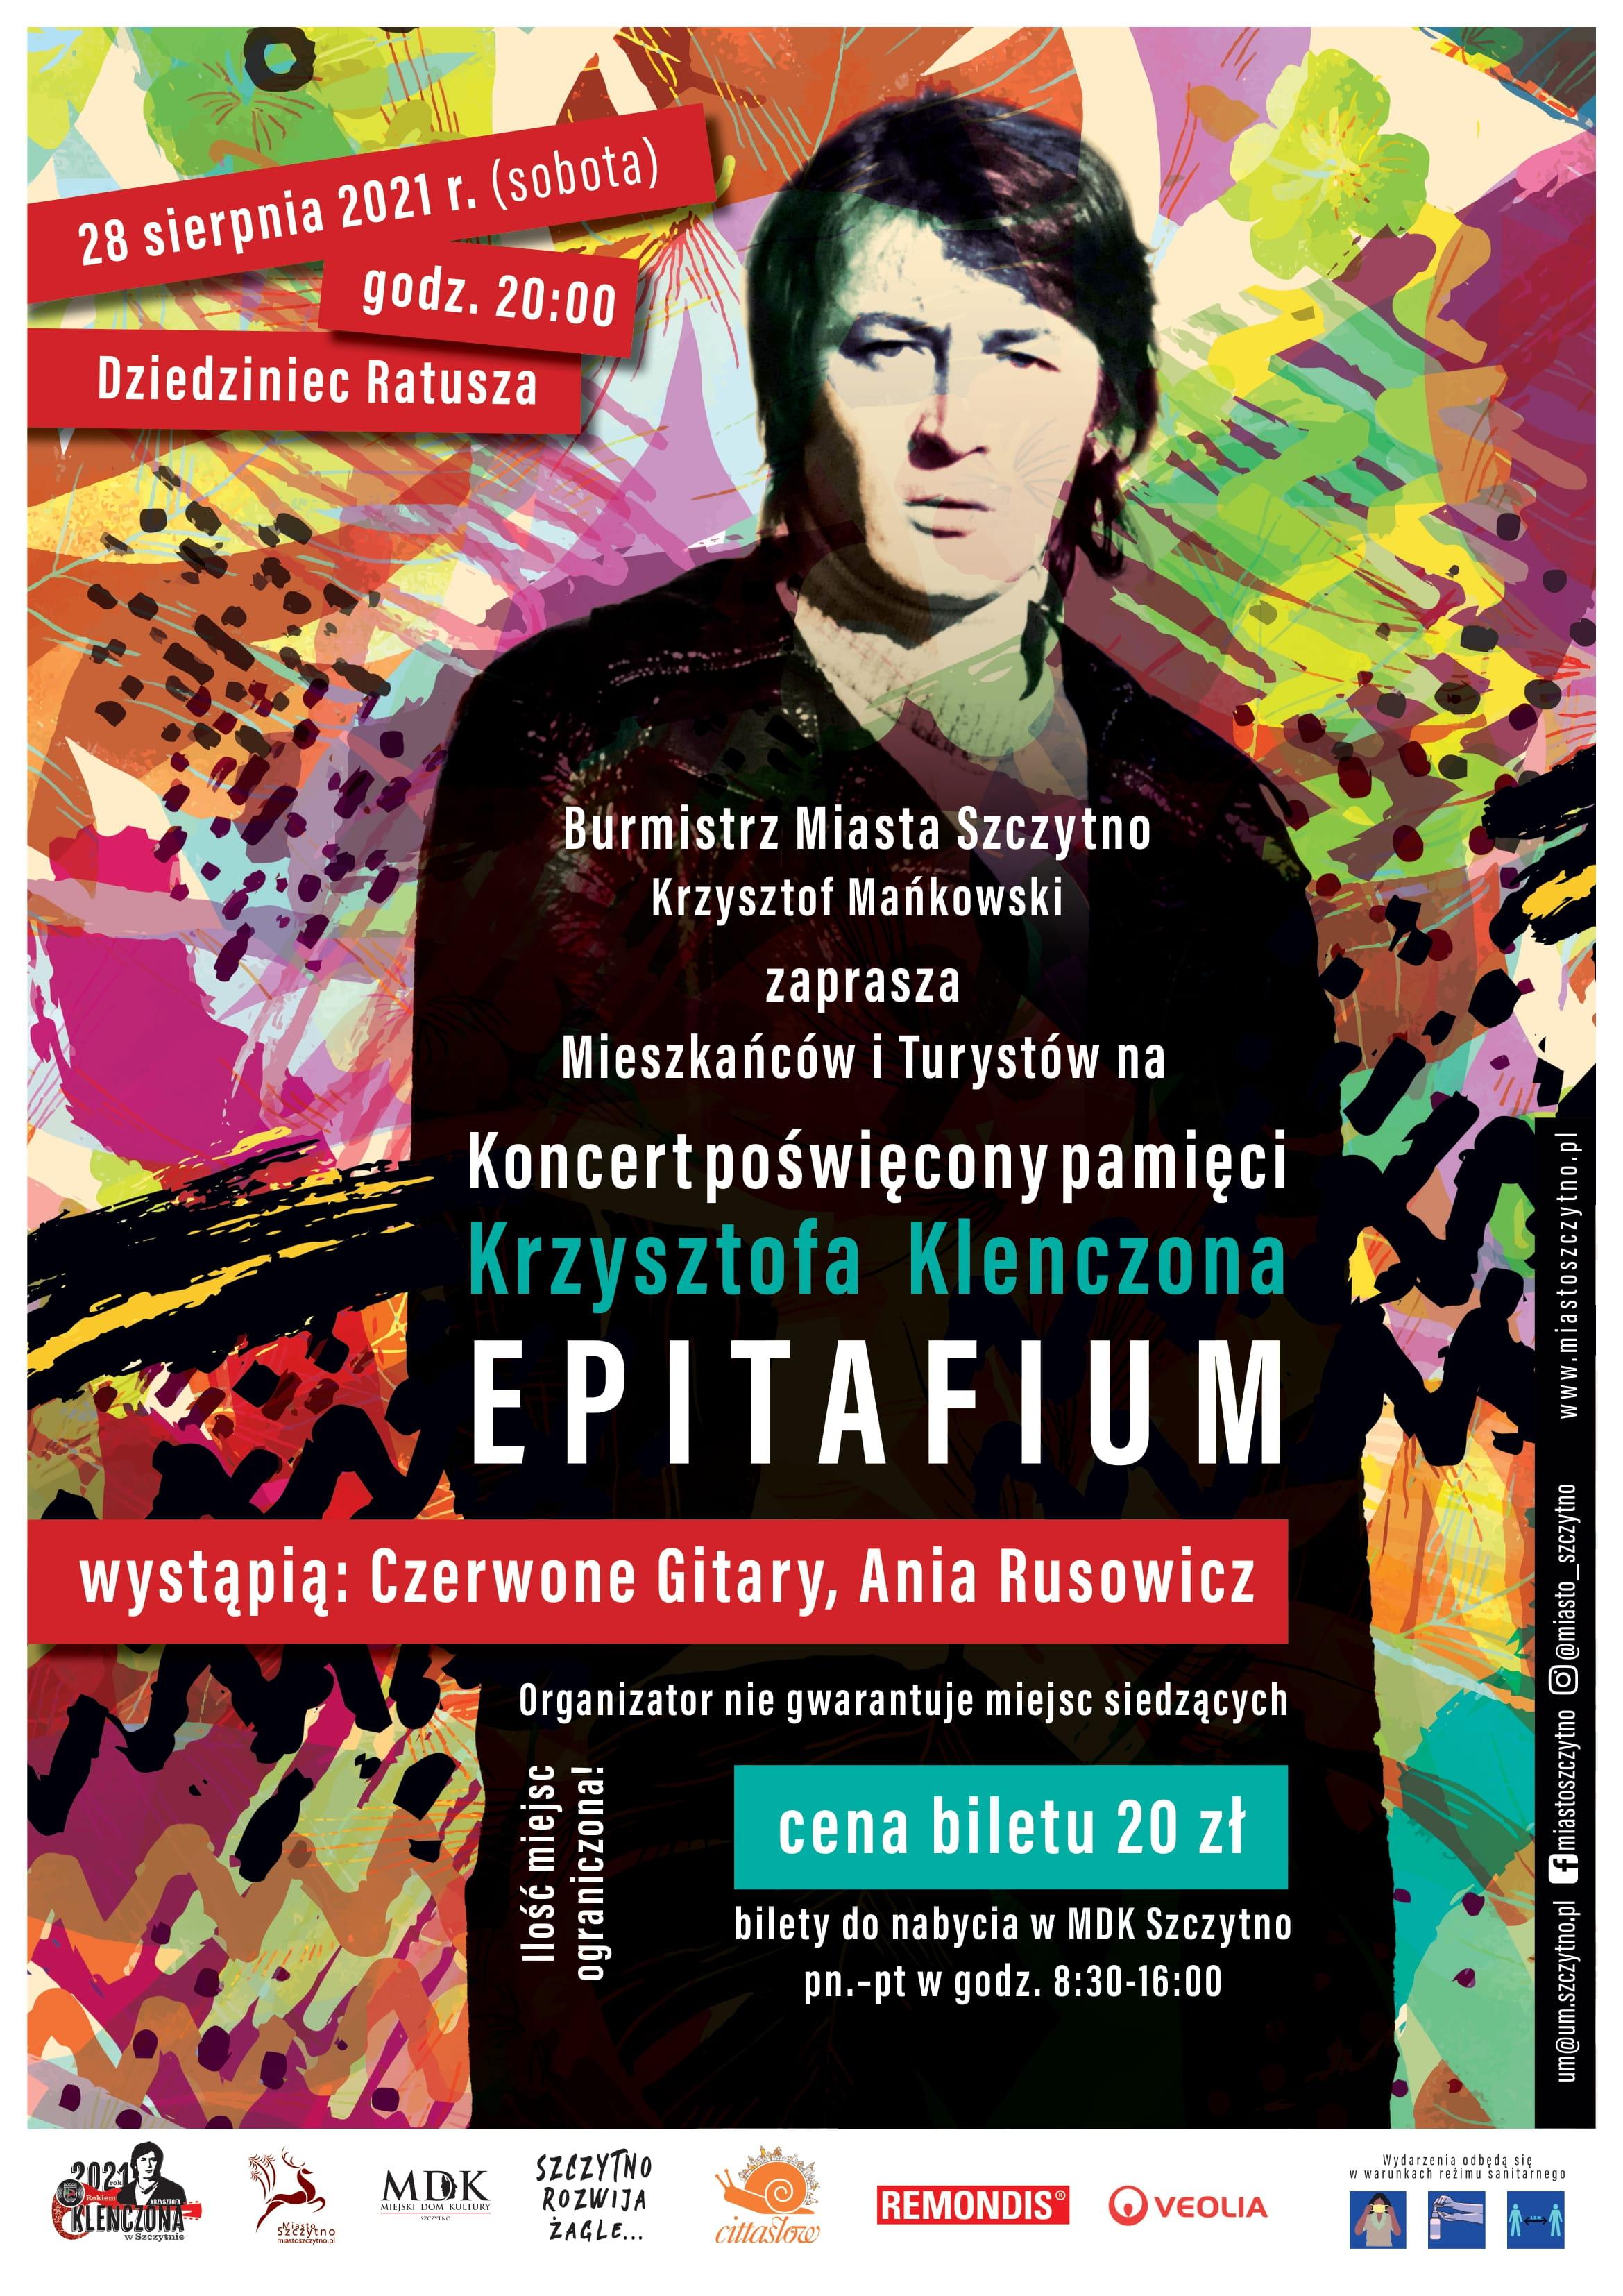 https://m.powiatszczycienski.pl/2021/08/orig/um-plakat-a3-epitafium-1-42474.jpg